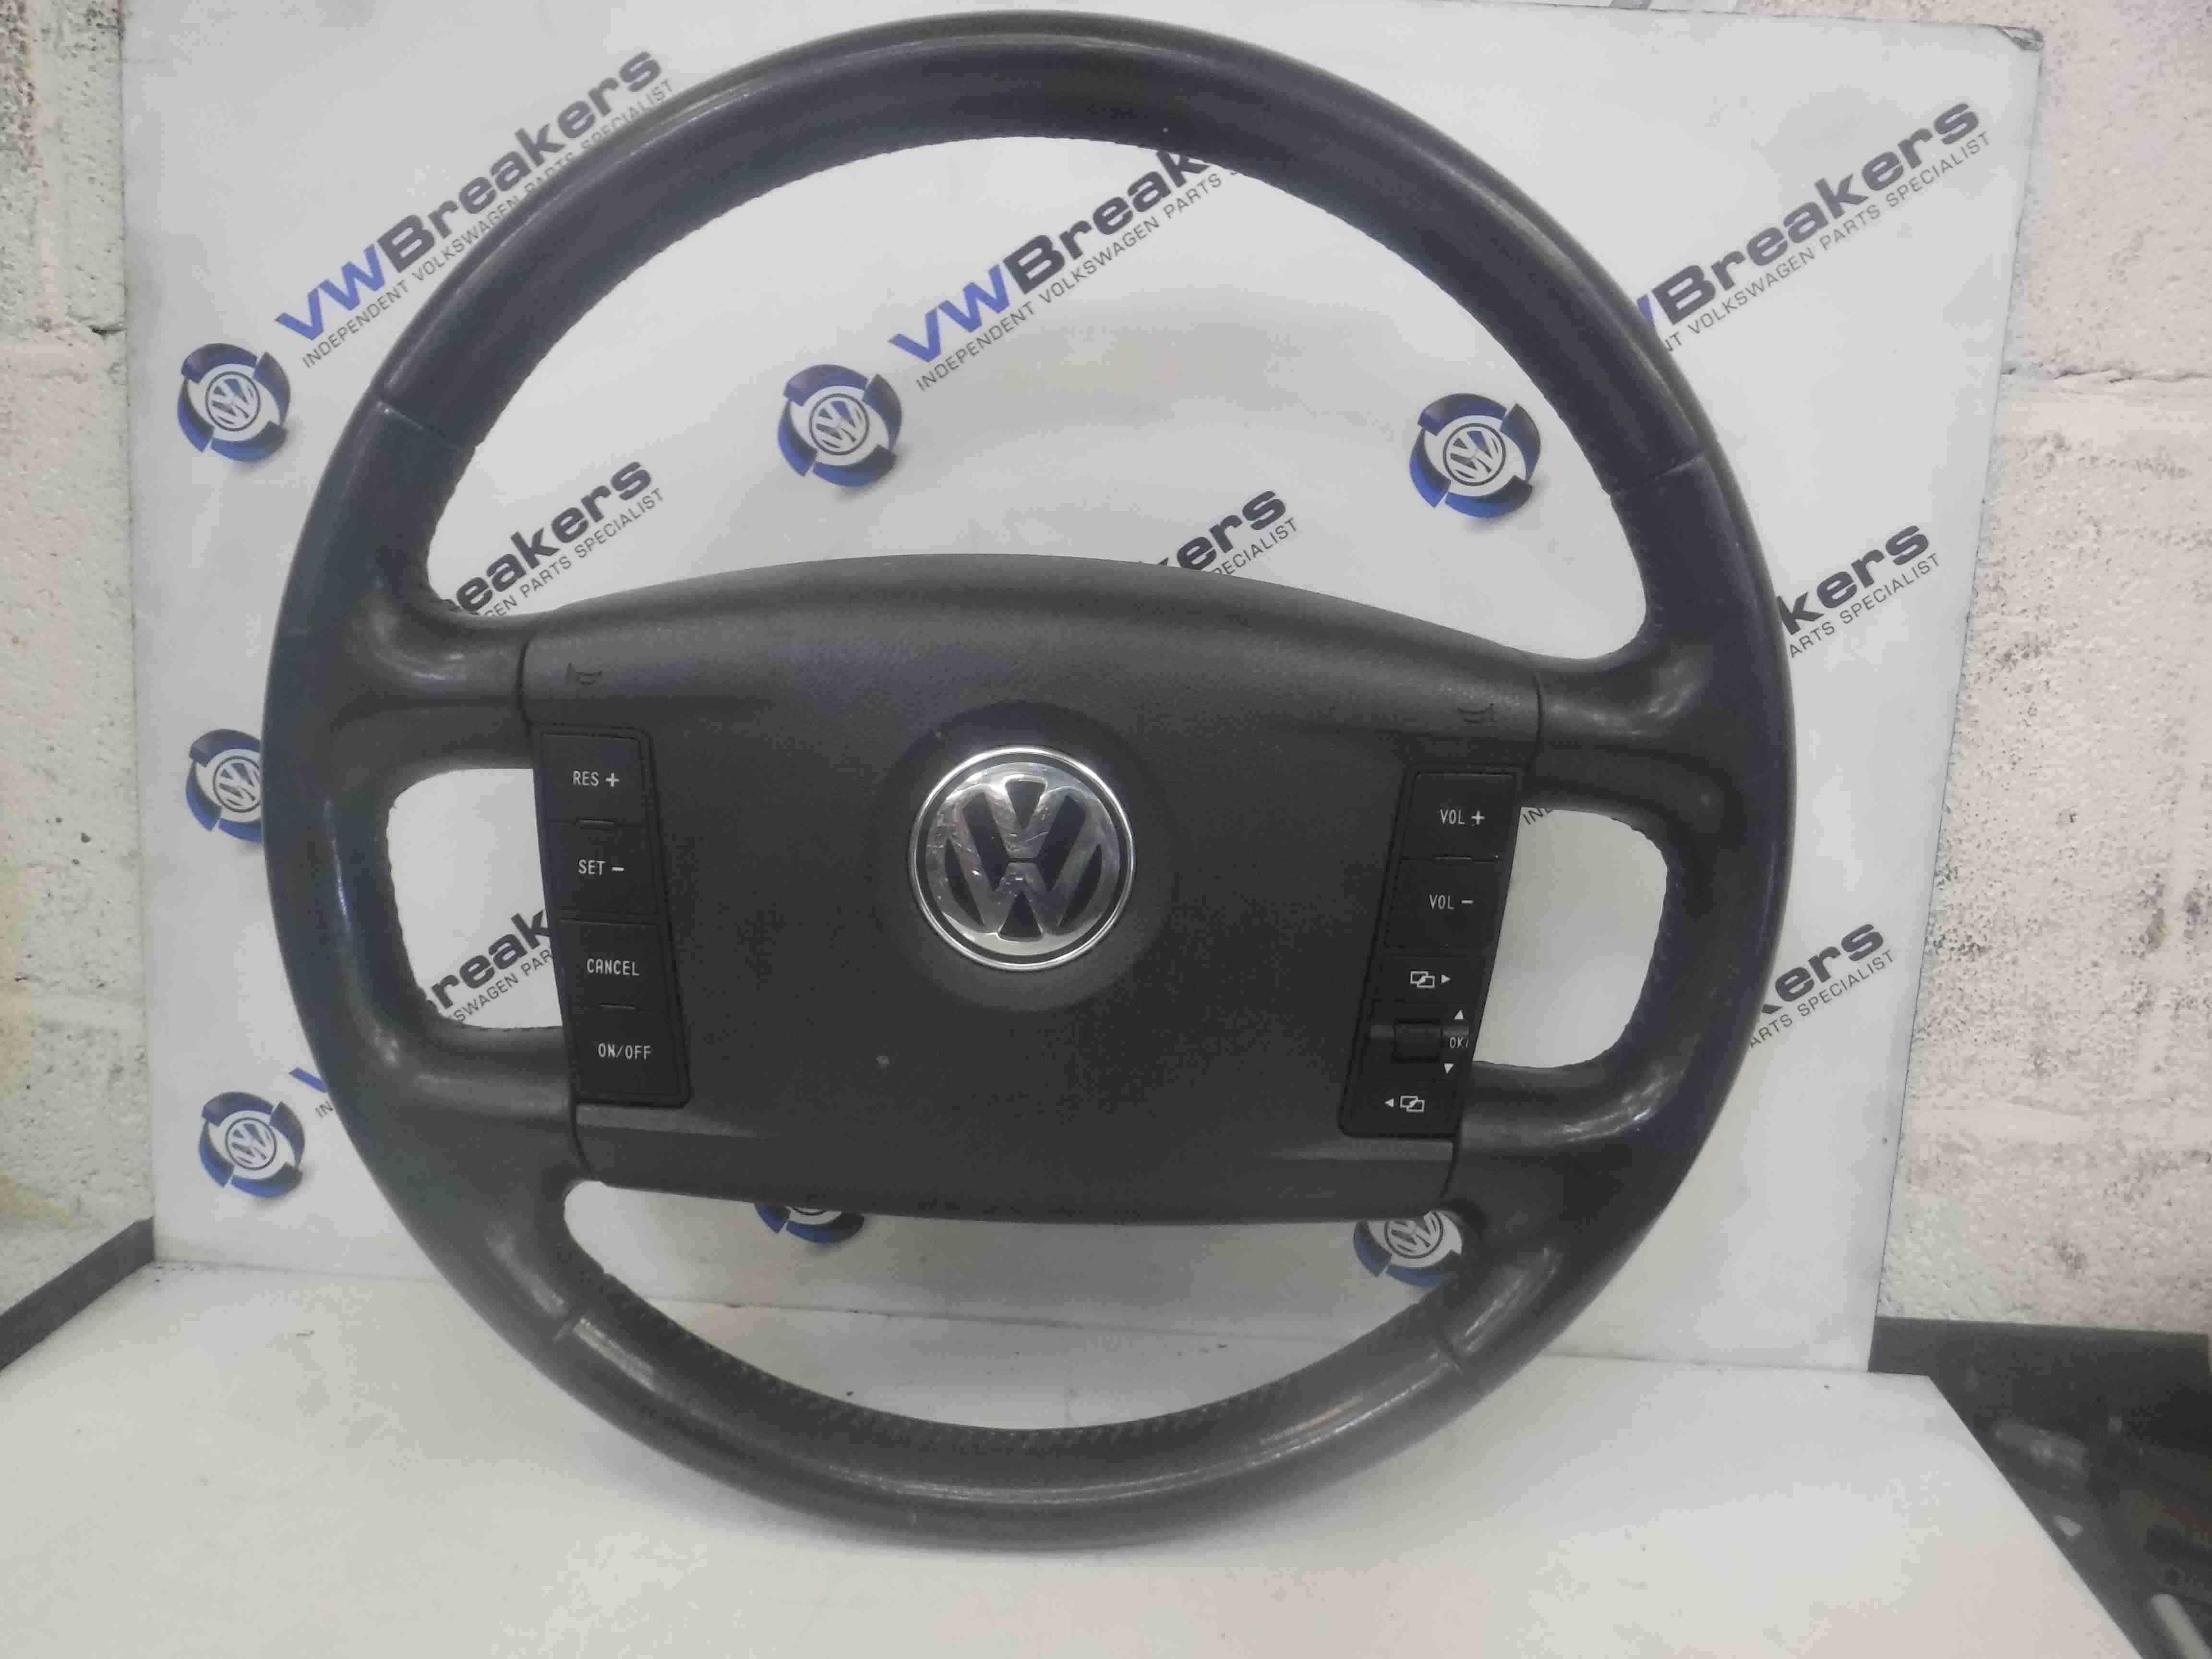 Volkswagen Touareg 2002-2007 Steering Wheel With Airbag